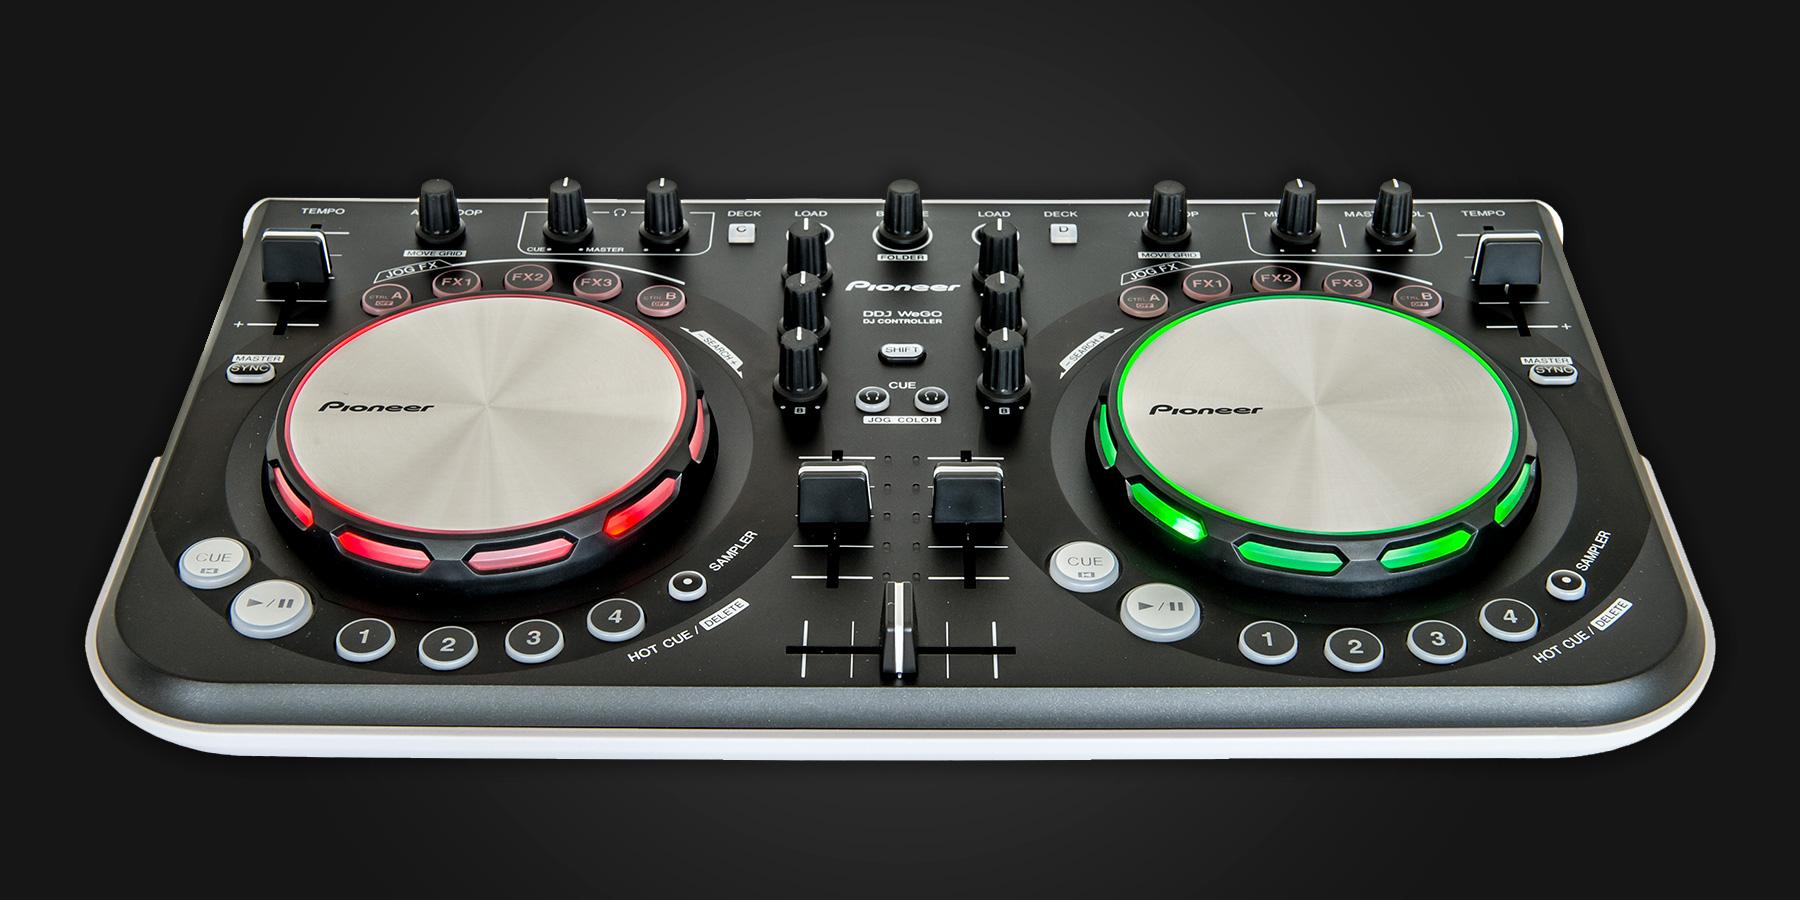 Download firmware or software for DDJ-WeGO - Pioneer DJ - Global